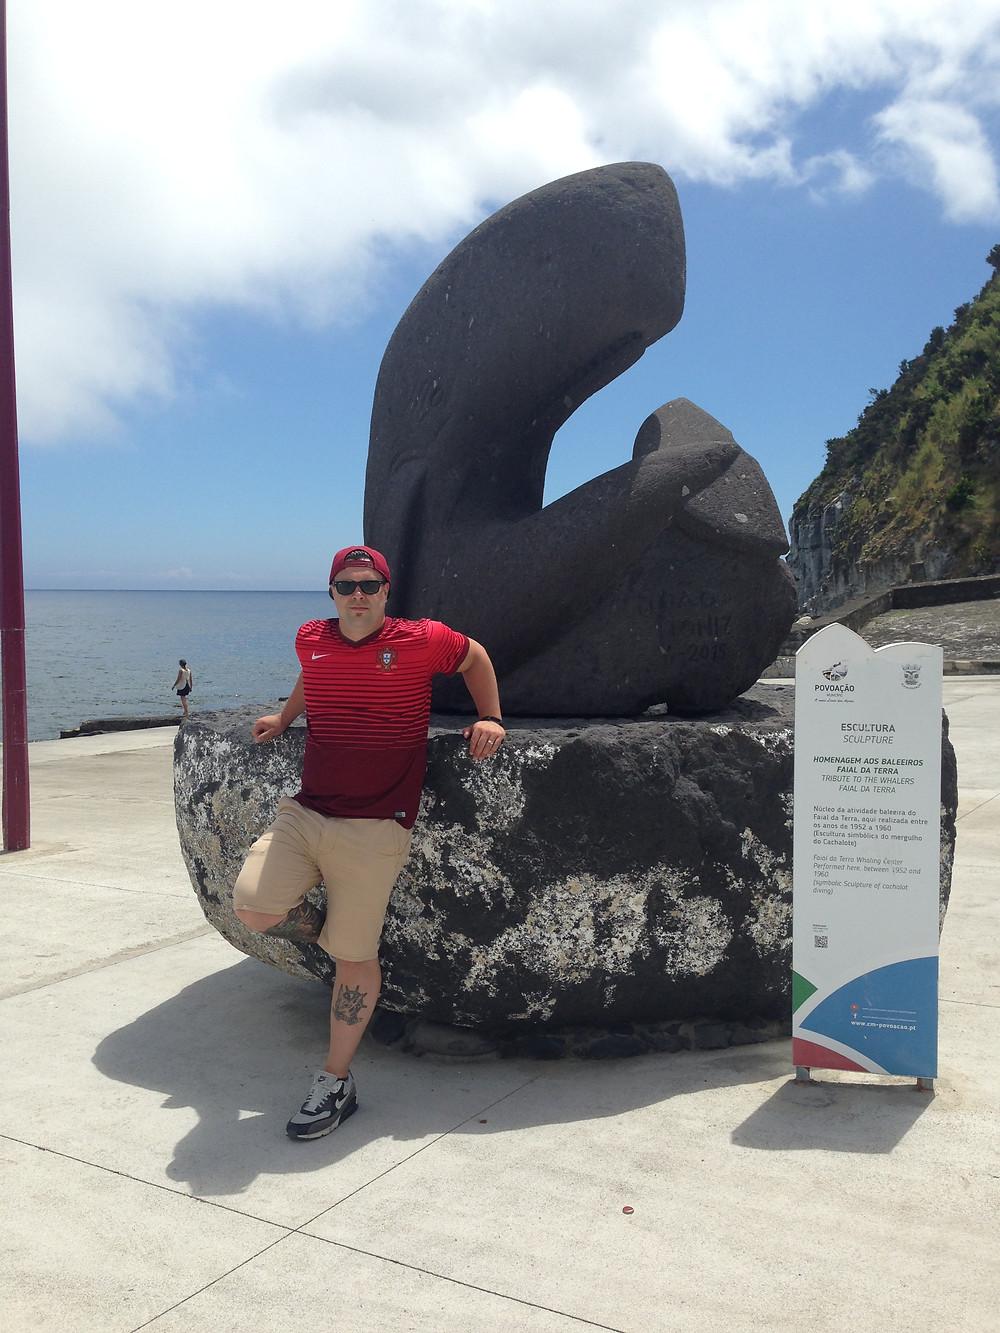 Mark posing at Port Nove, the main whaling boat launch in Faial Da Terra, Portugal